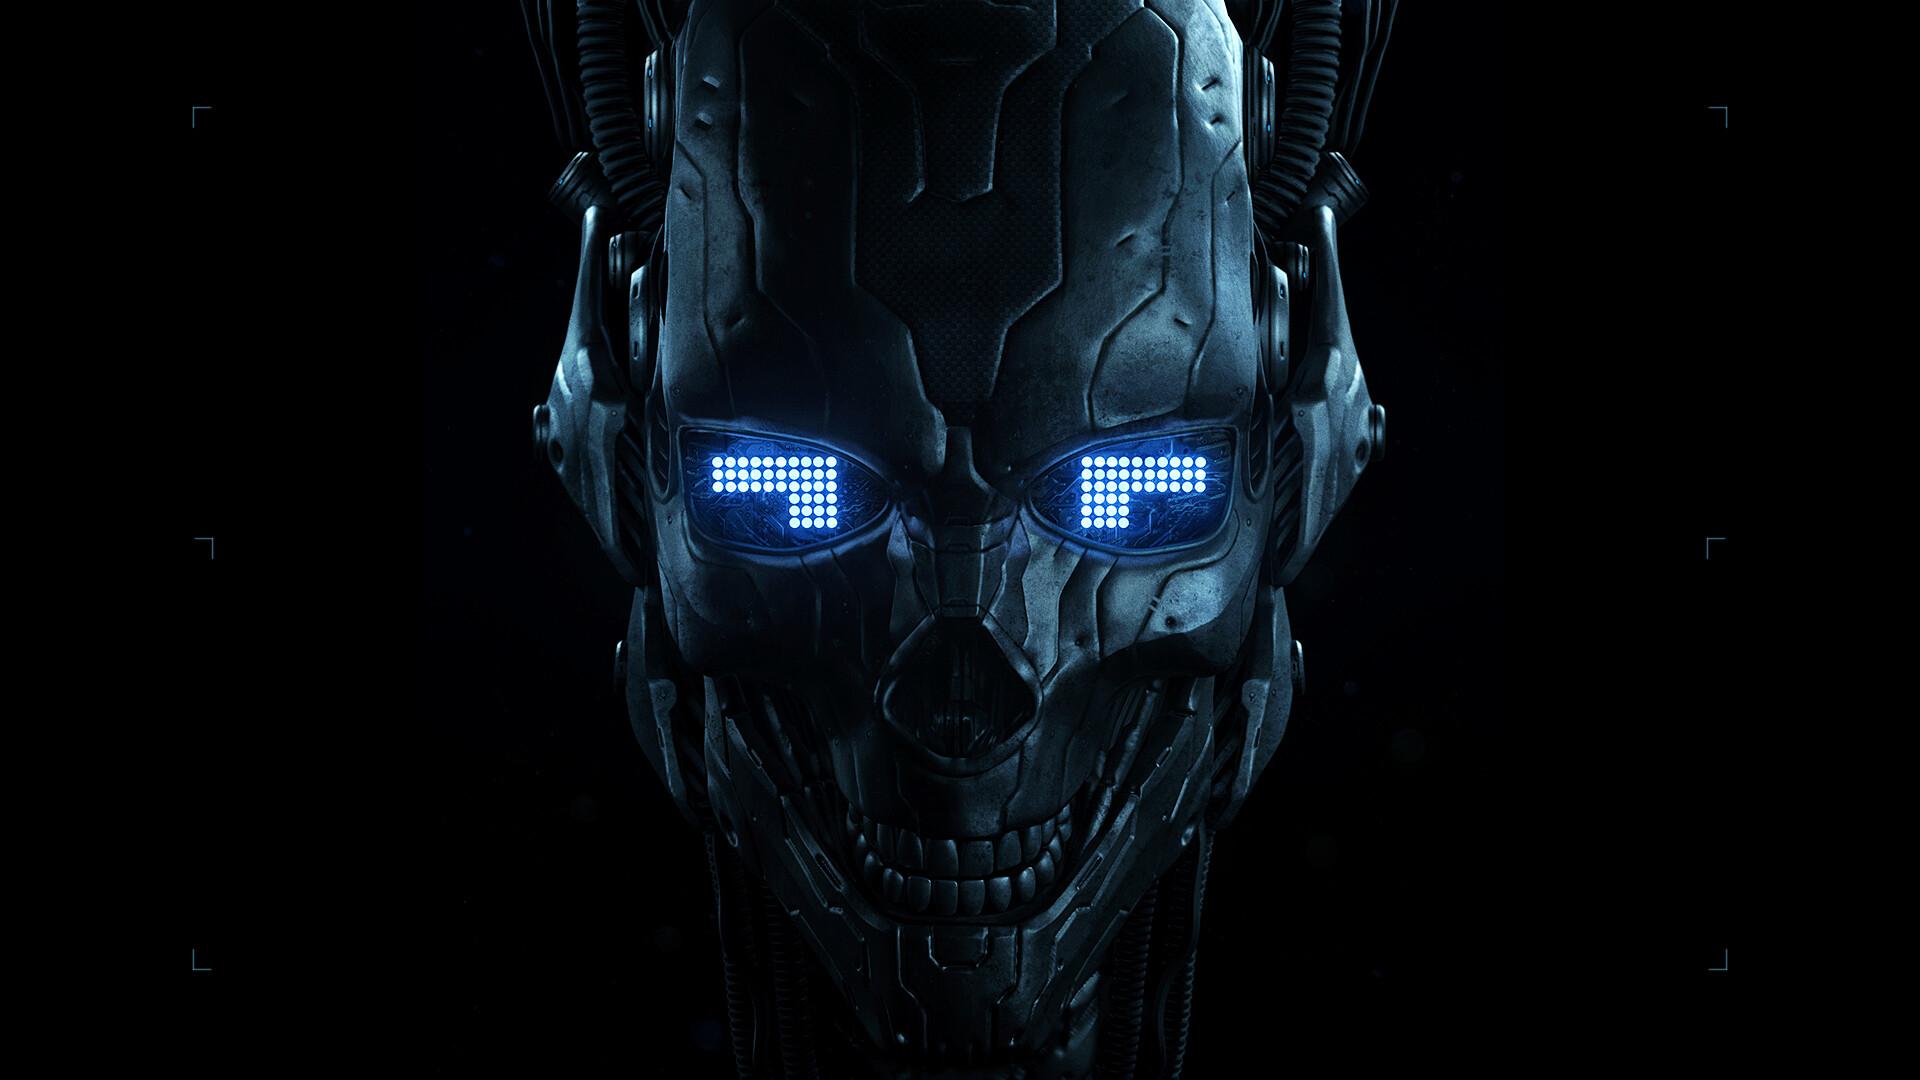 Robot Skull Wallpaper Hd Artist 4k Wallpapers Images